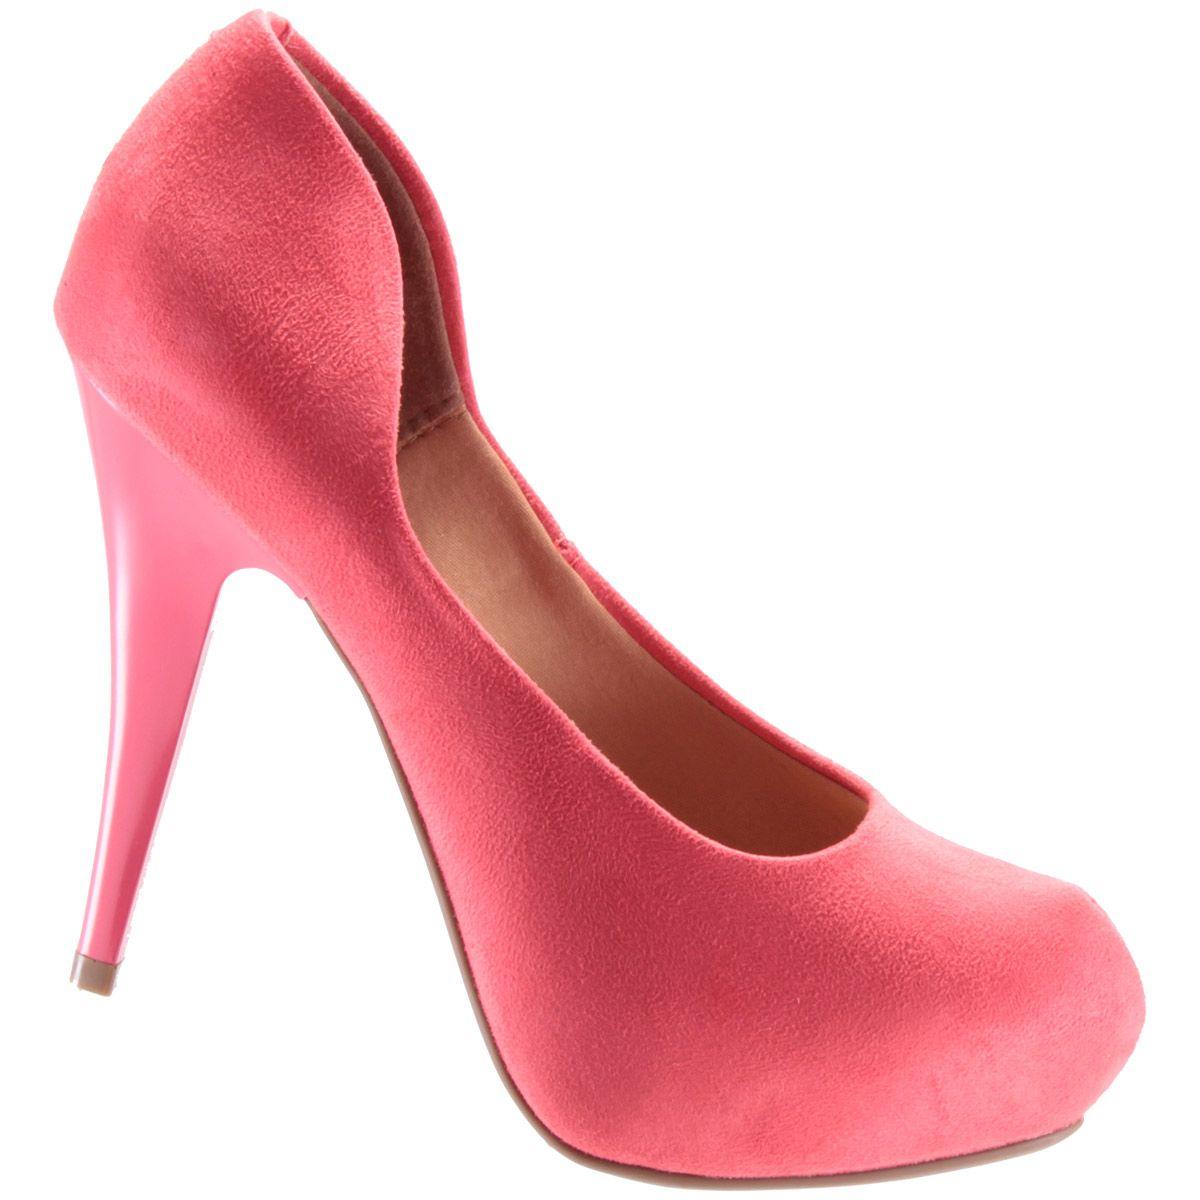 Scarpin Vizzano Sapato Meia Pata Feminino Camurça 1143300  - Ian Calçados